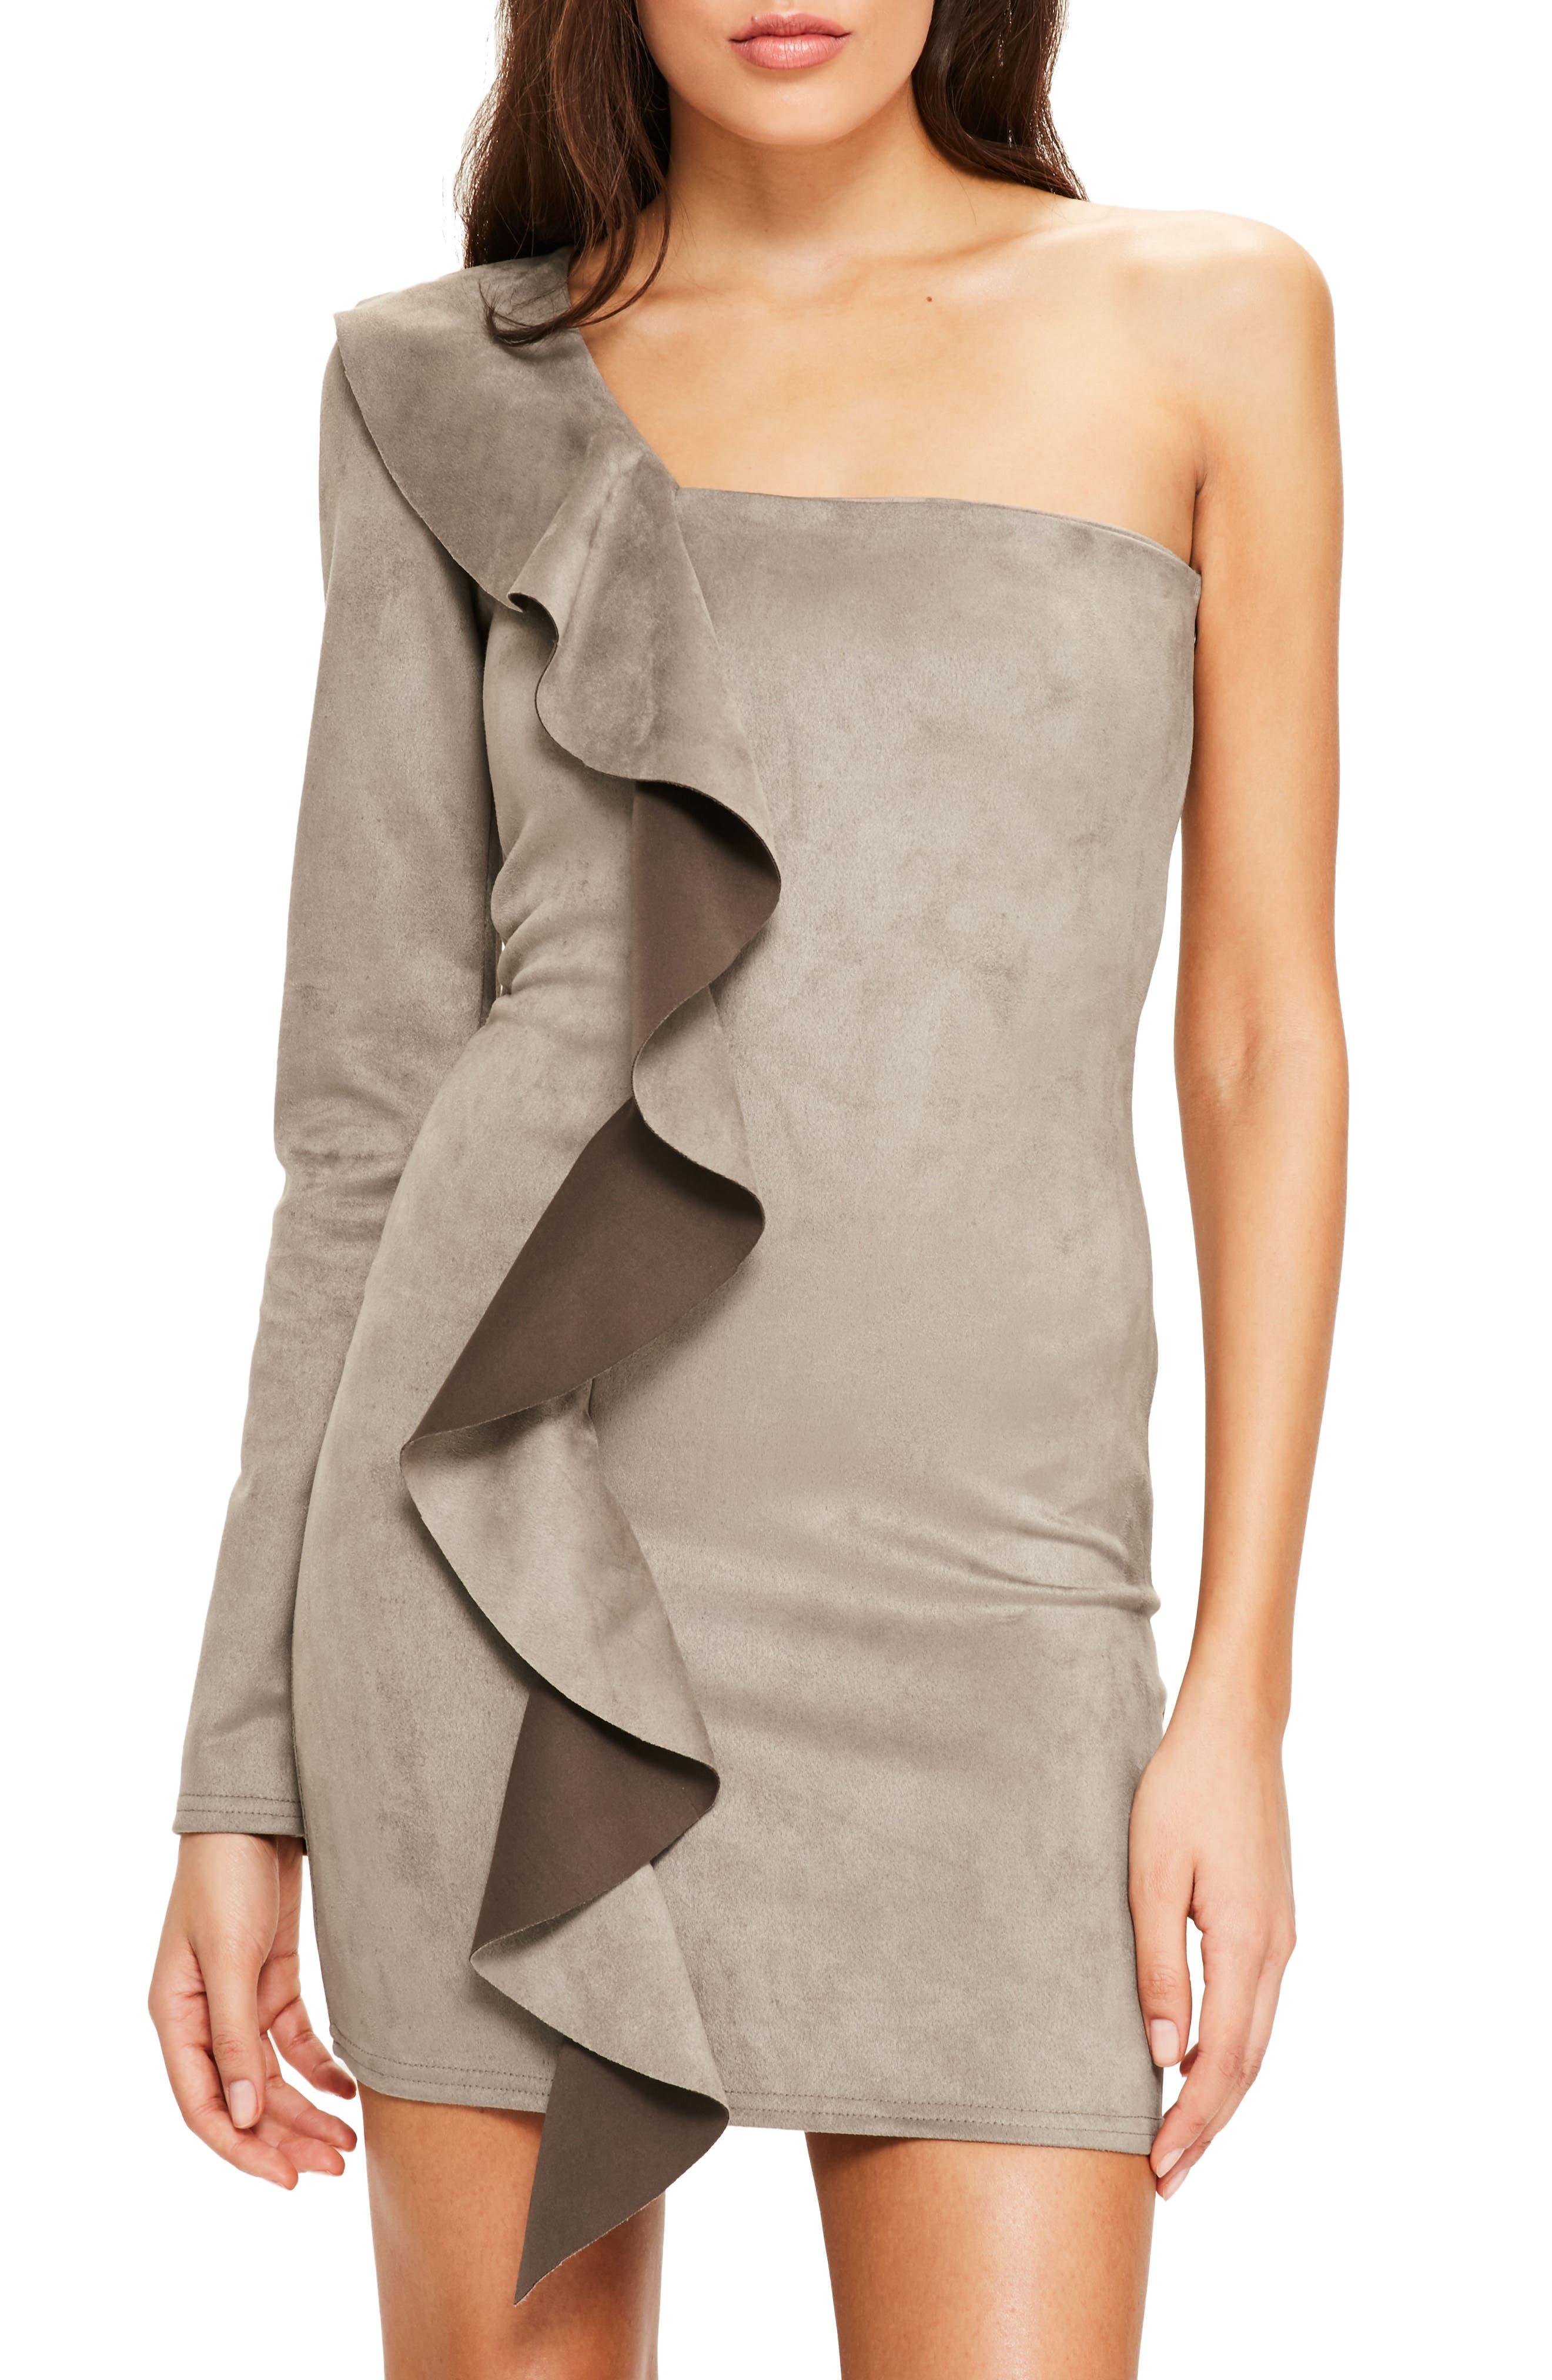 Alternate Image 1 Selected - Missguided One-Shoulder Suede Minidress